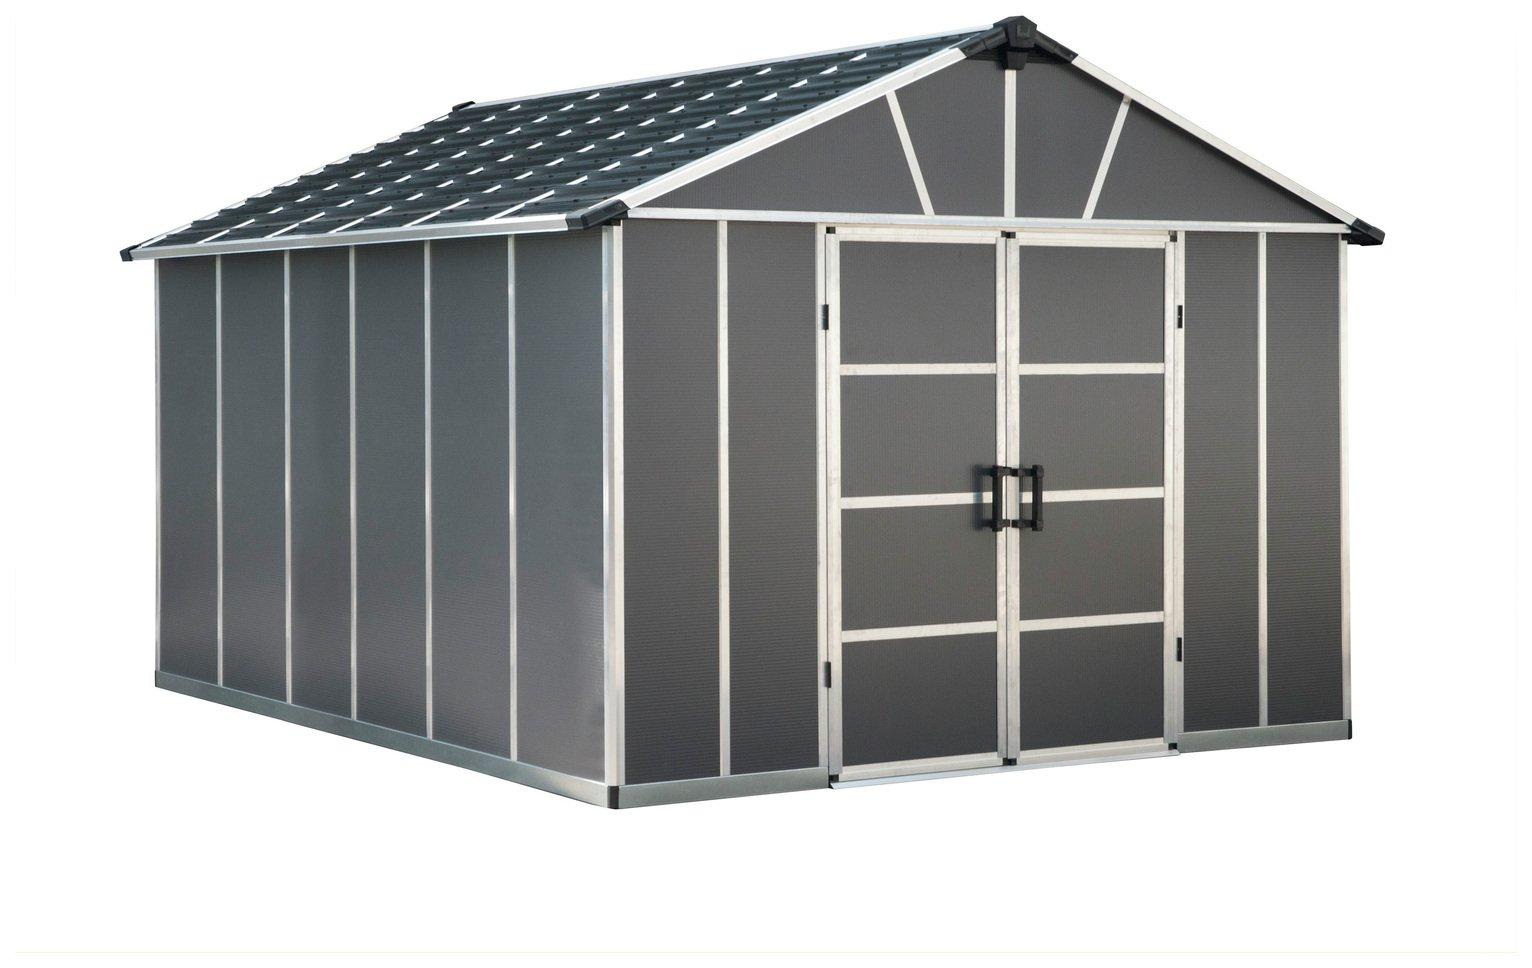 Palram Yukon Plastic 11x13ft Shed with Floor - Dark Grey